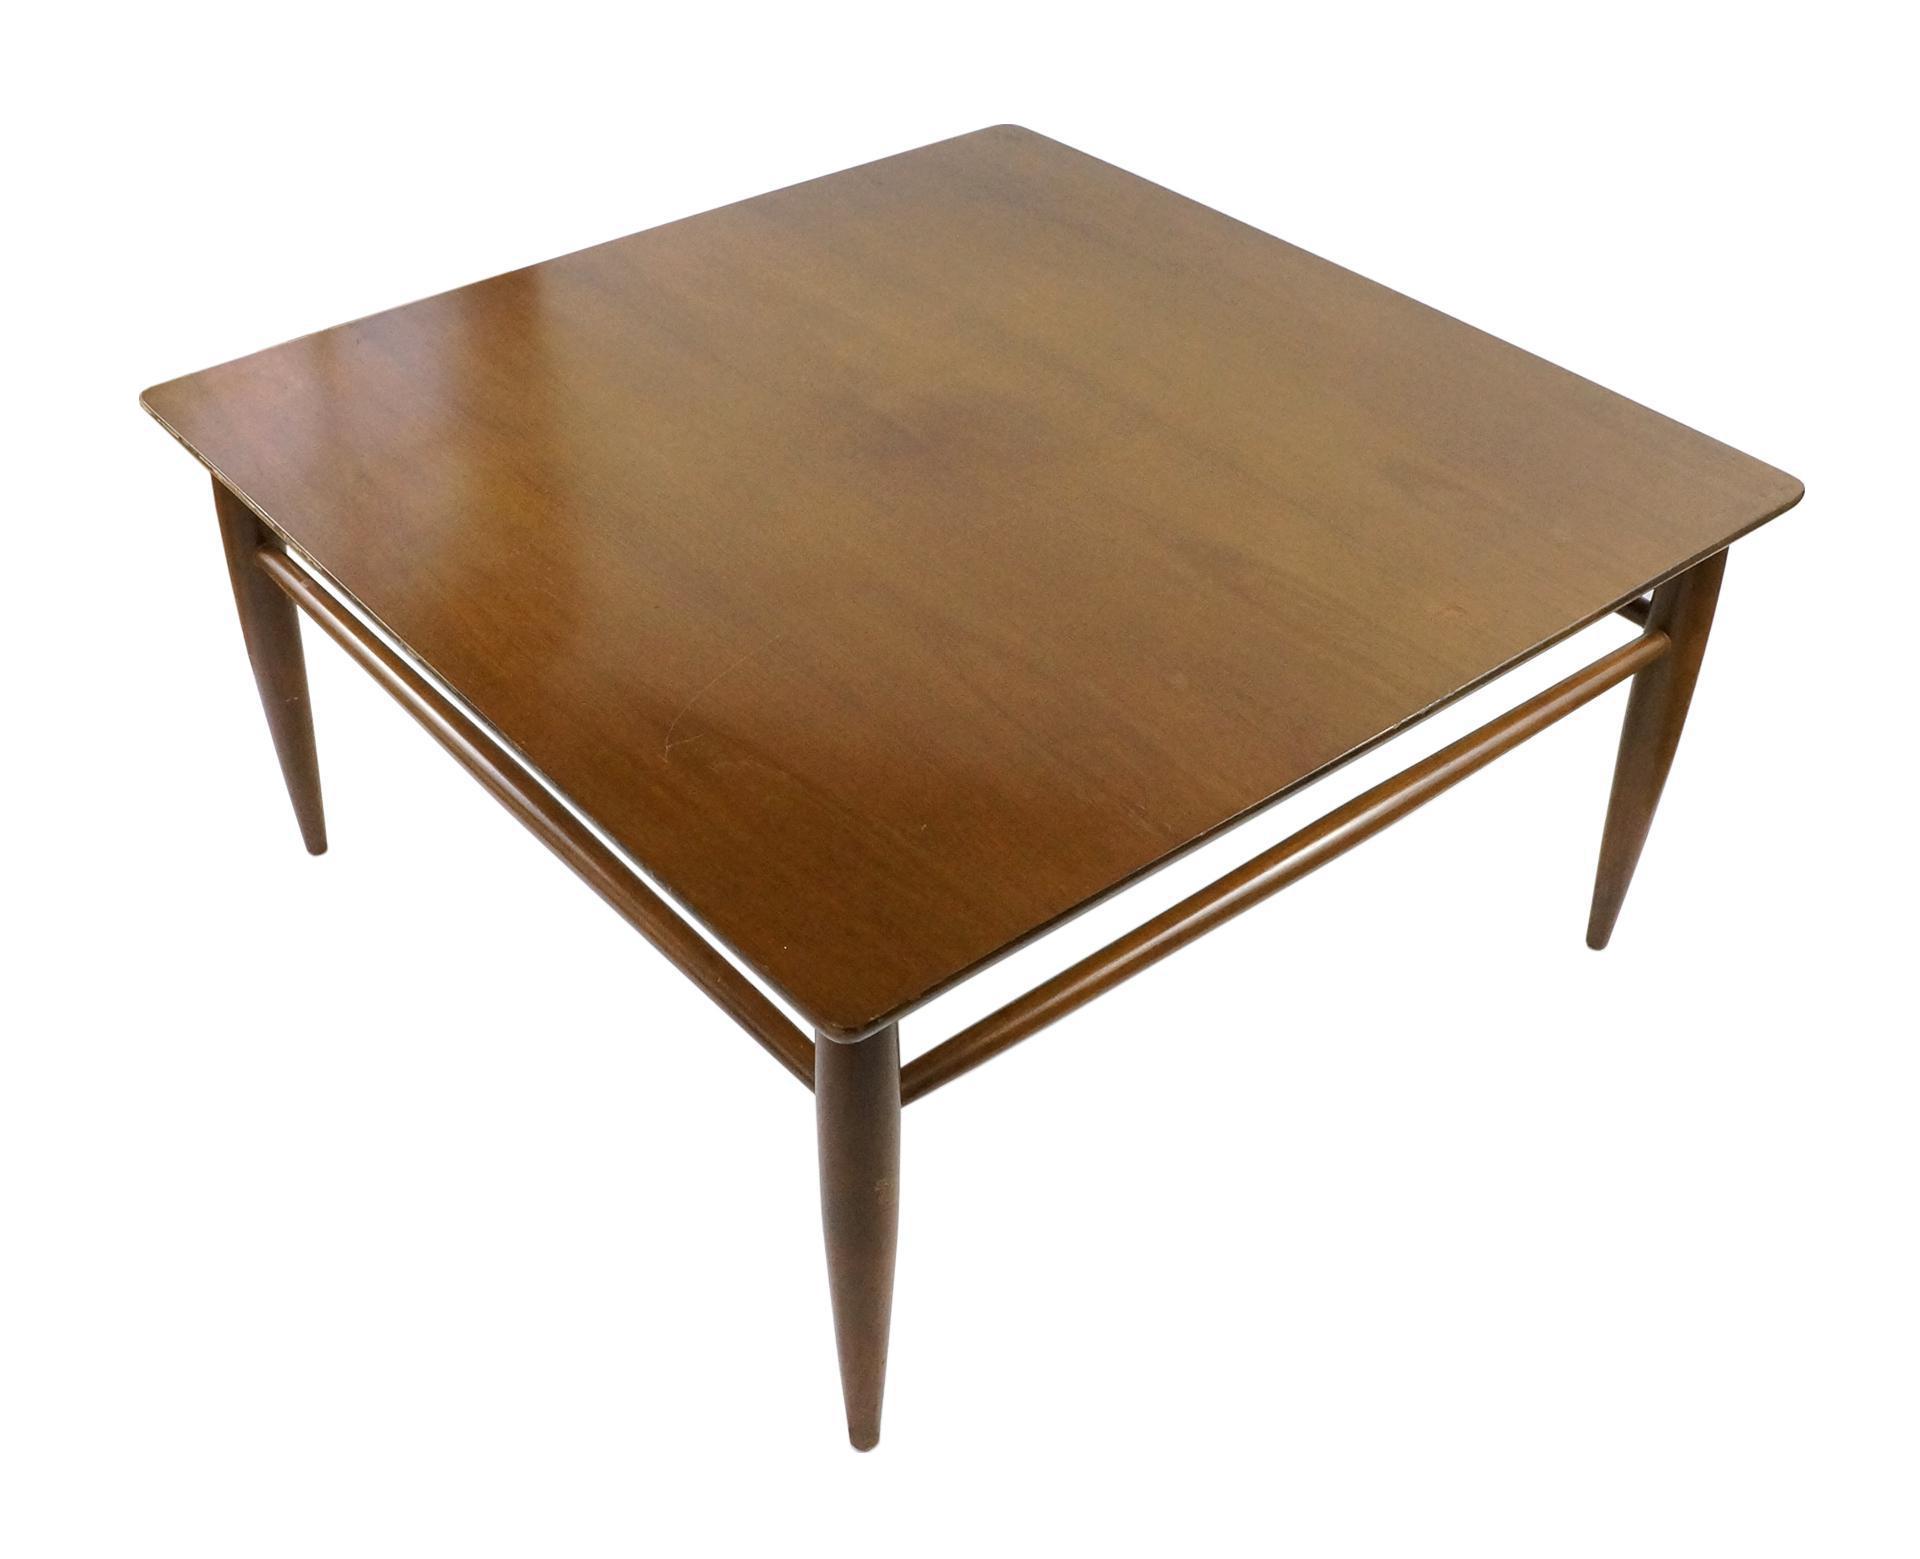 Image of: Mid Century Modern Mersman Coffee Table Chairish